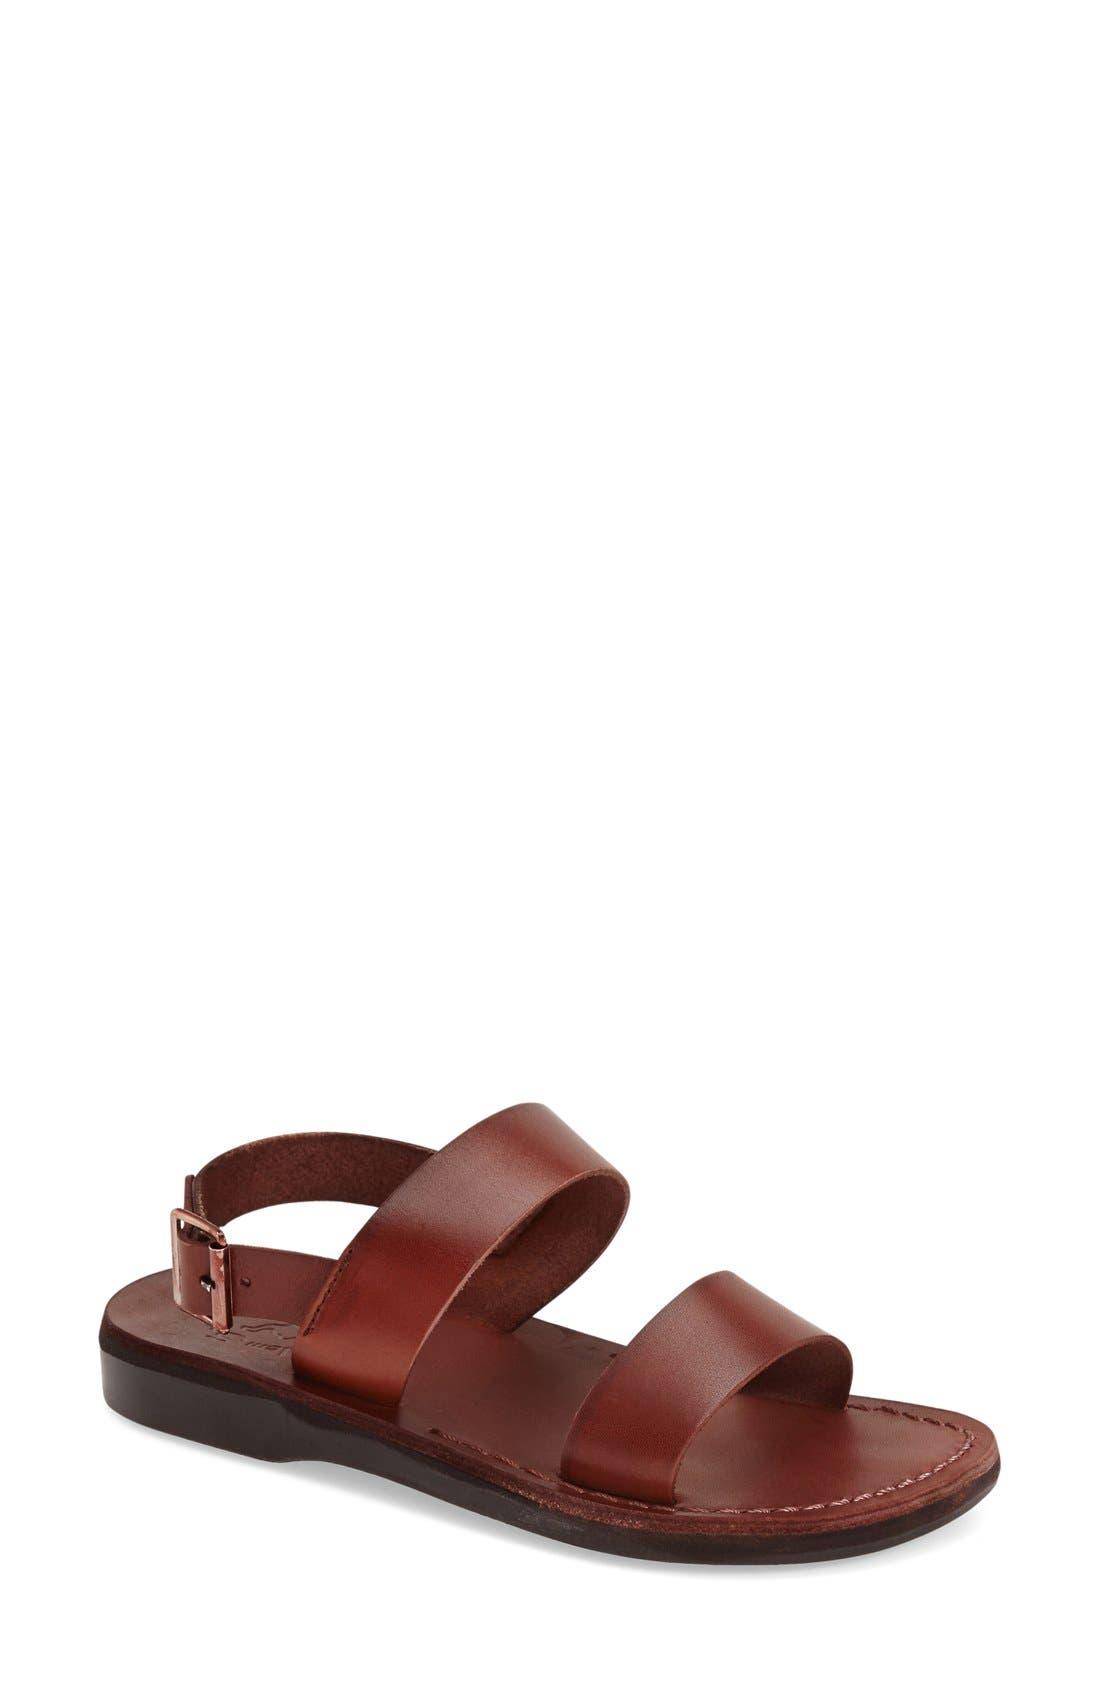 'Golan' Sandal,                         Main,                         color, 200